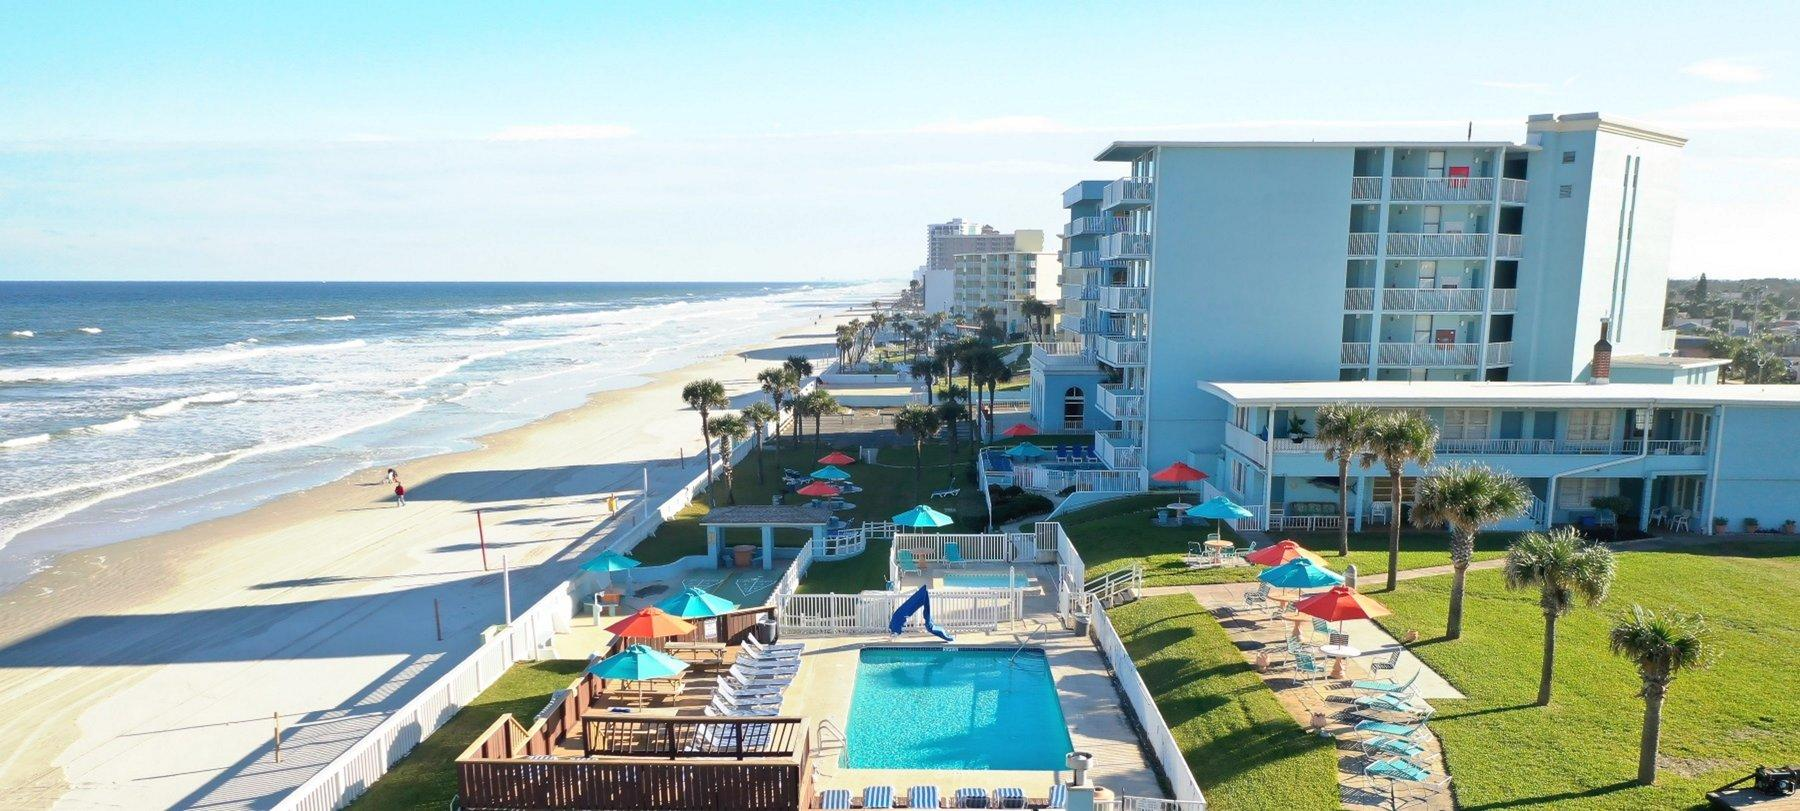 Exterior photo of El Caribe Resort.